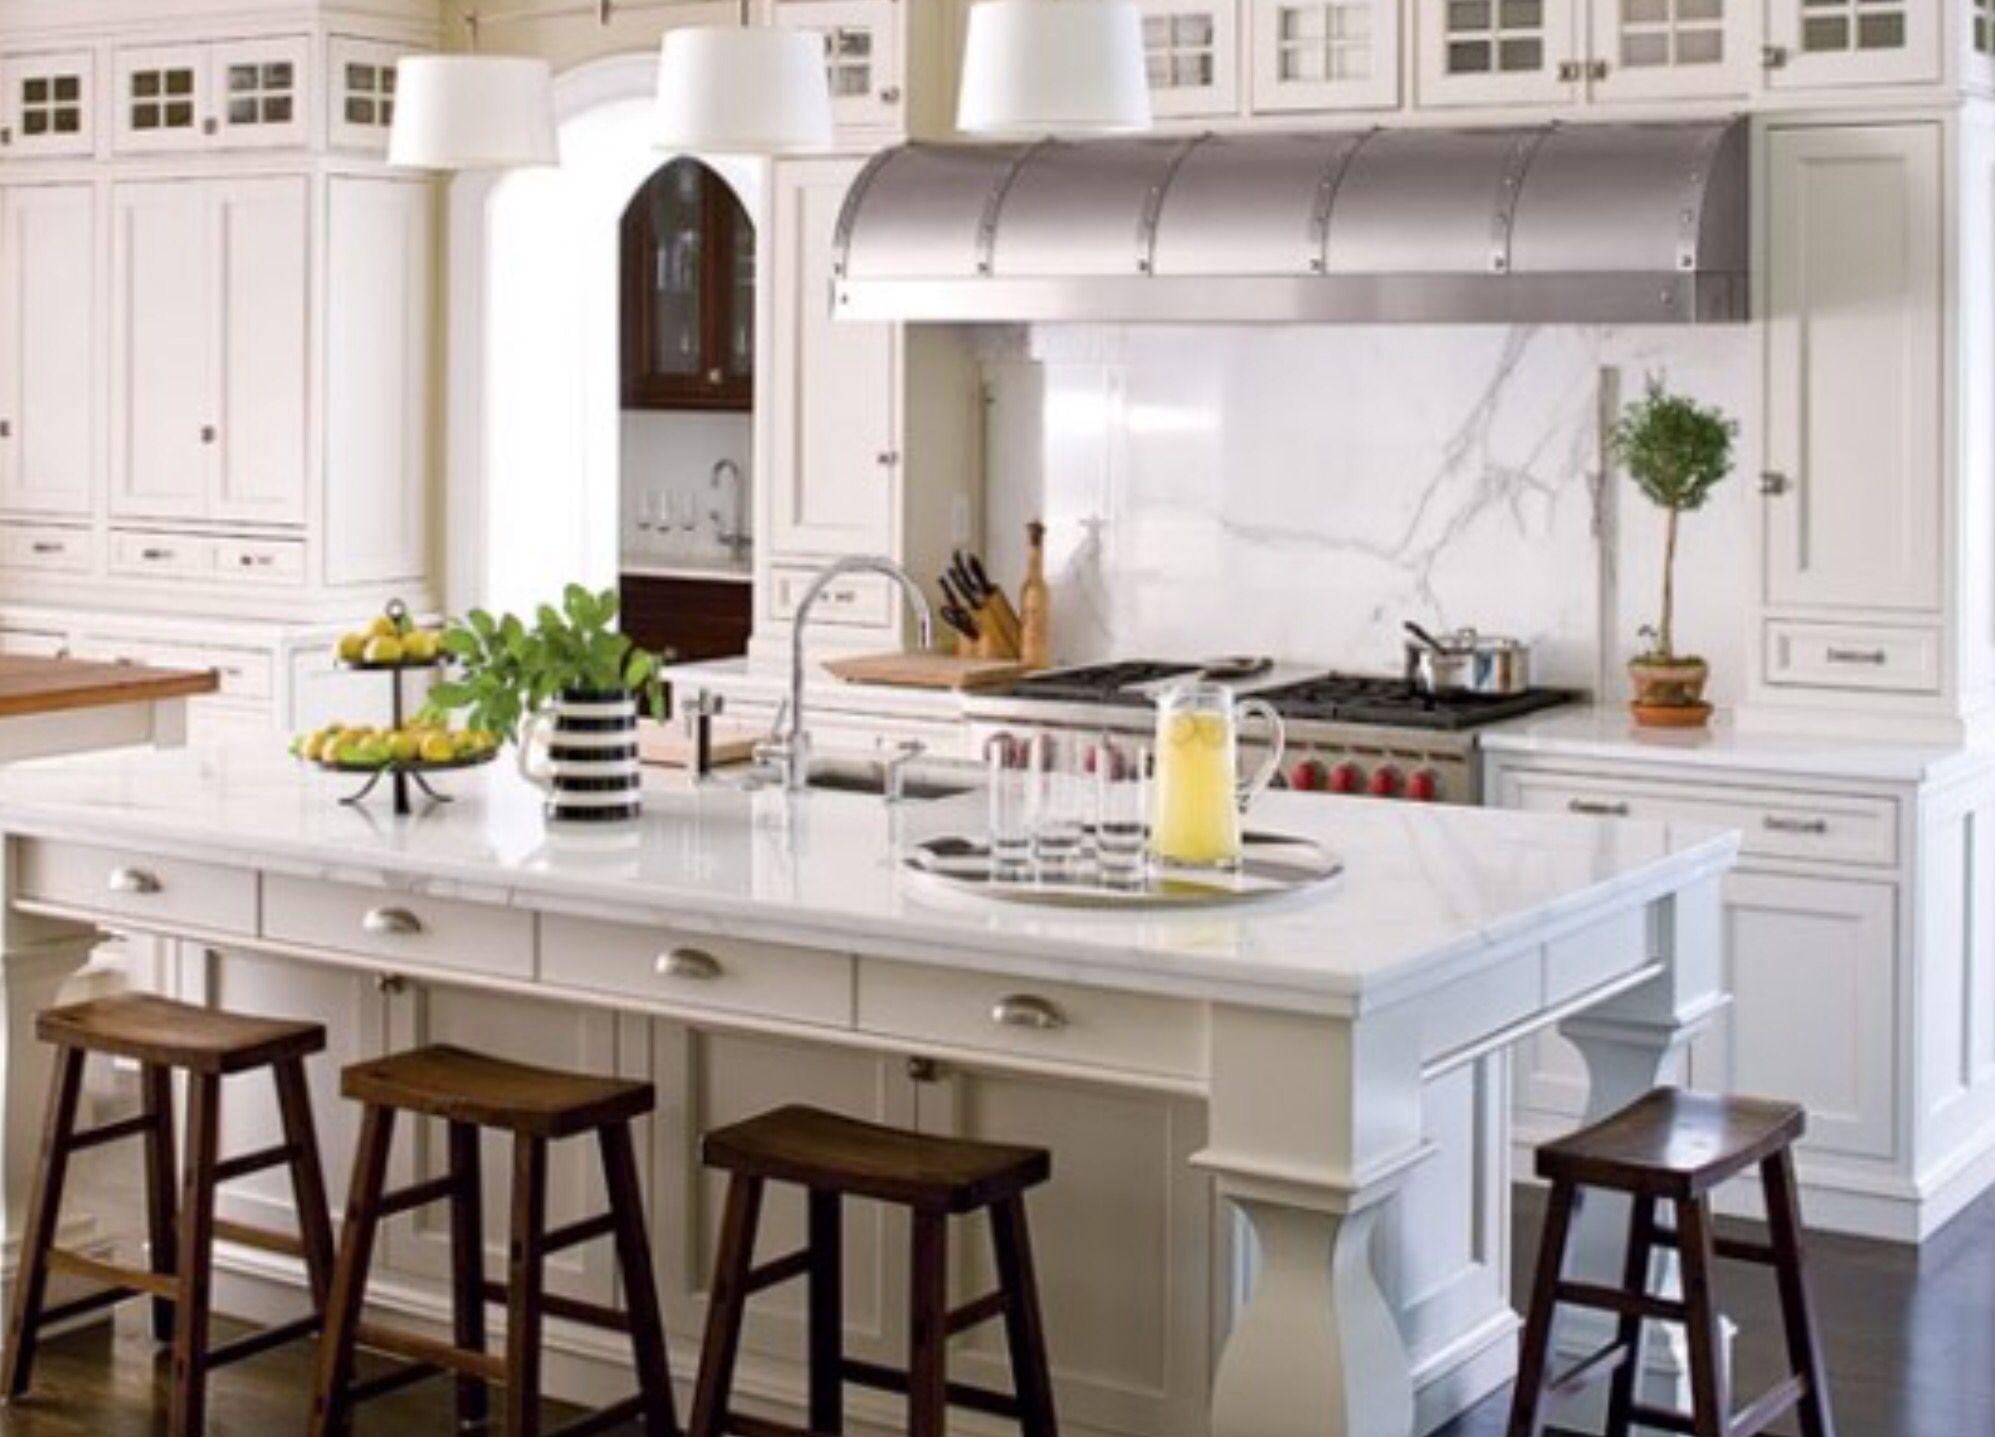 30 Amazing Design Ideas For A Kitchen Backsplash: I Like The Drawers Above The Bar Stools. I'd Like To Add